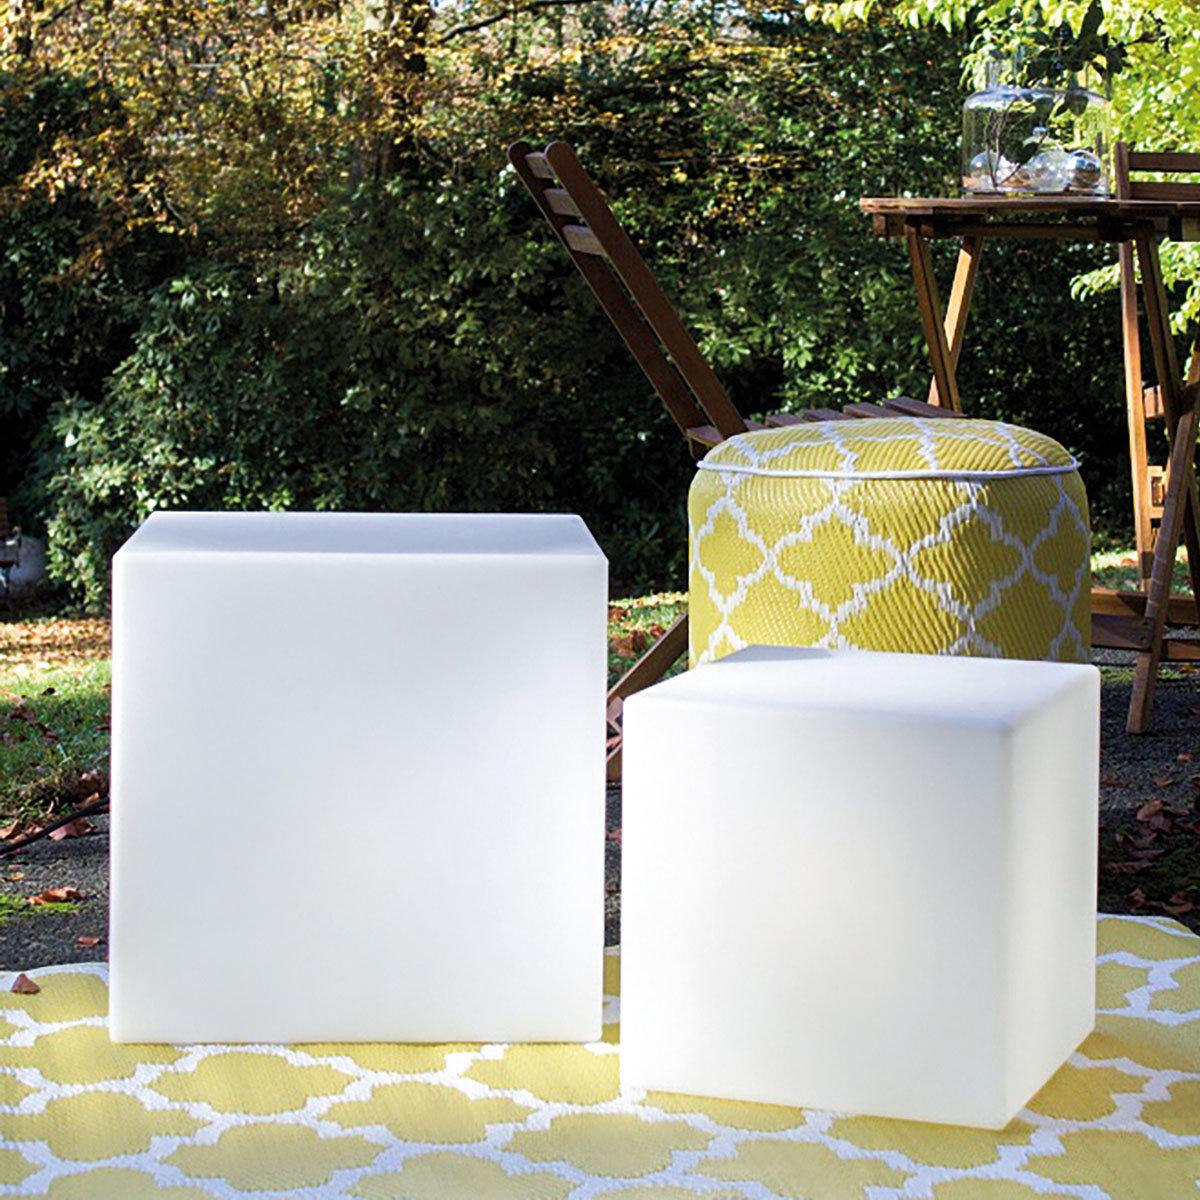 Solar-Leuchte Shining Cube, 33 cm